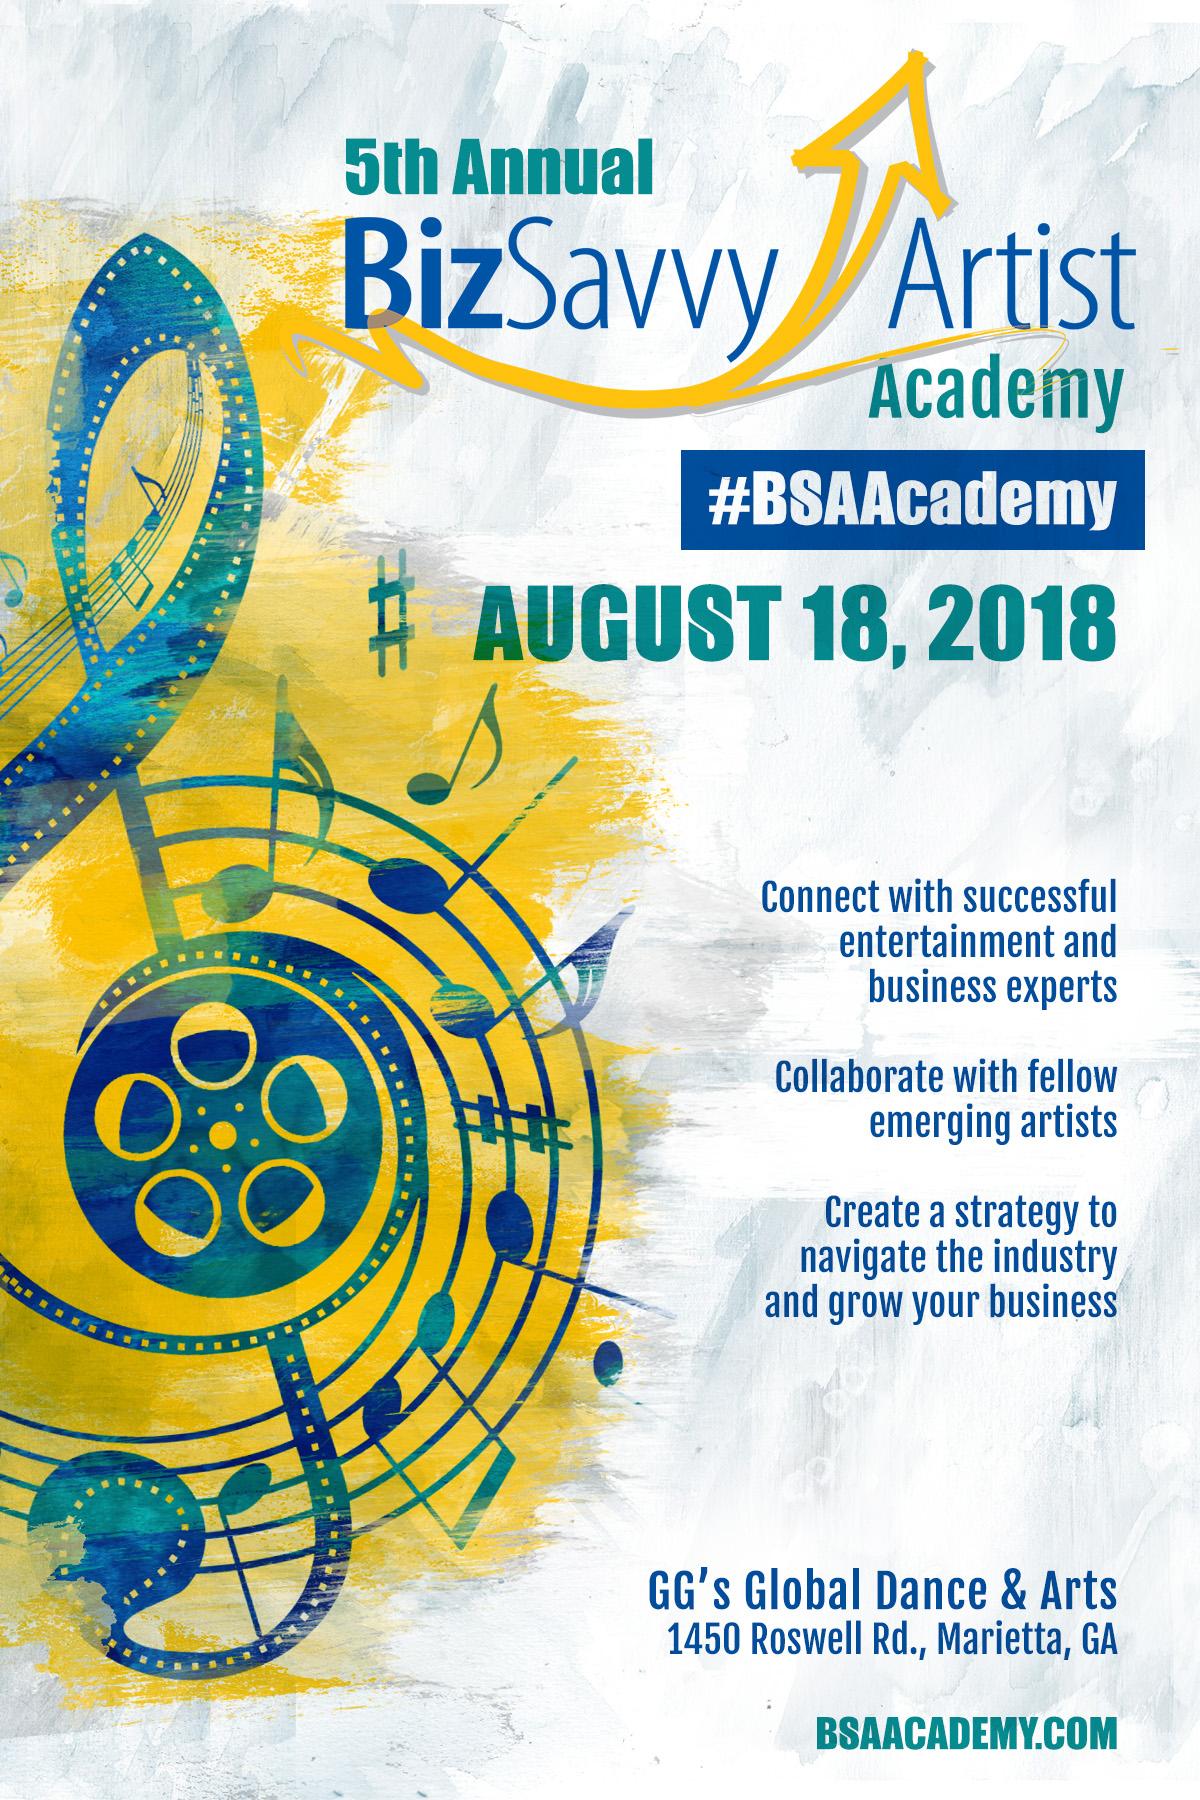 Biz Savvy Artist Academy 2018 flyer